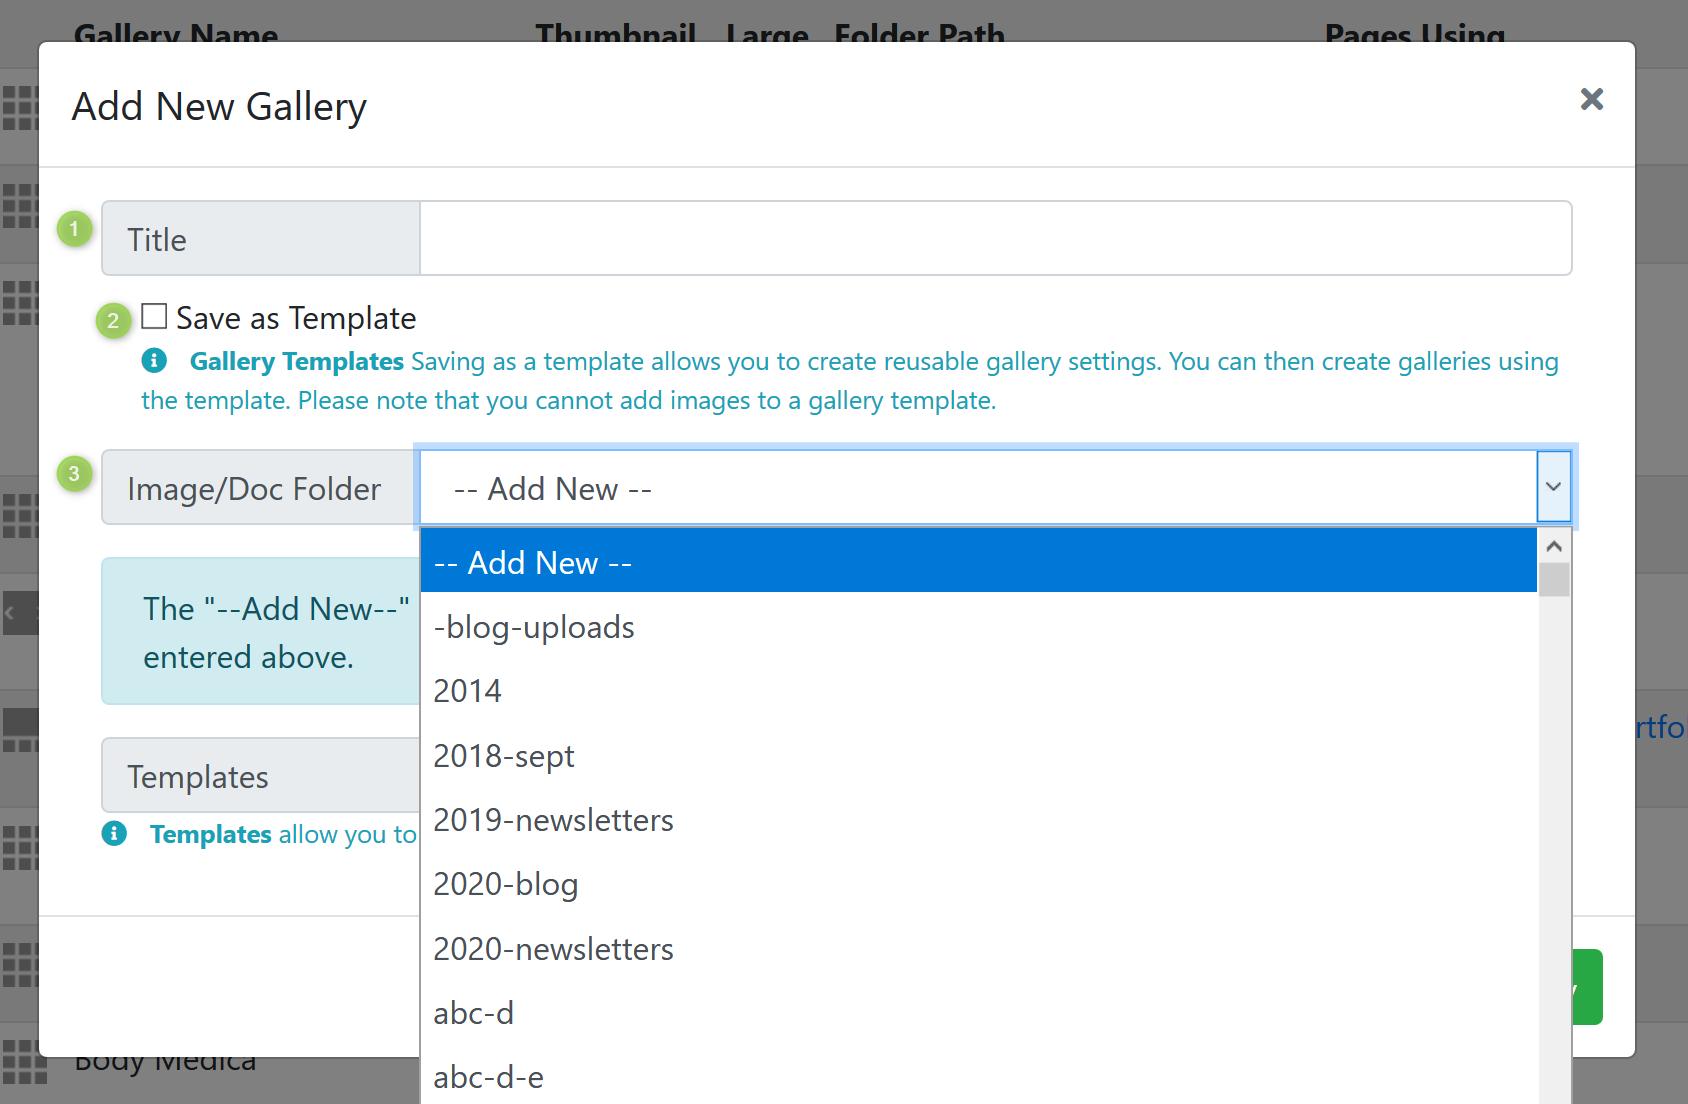 Gallery Information Screenshot